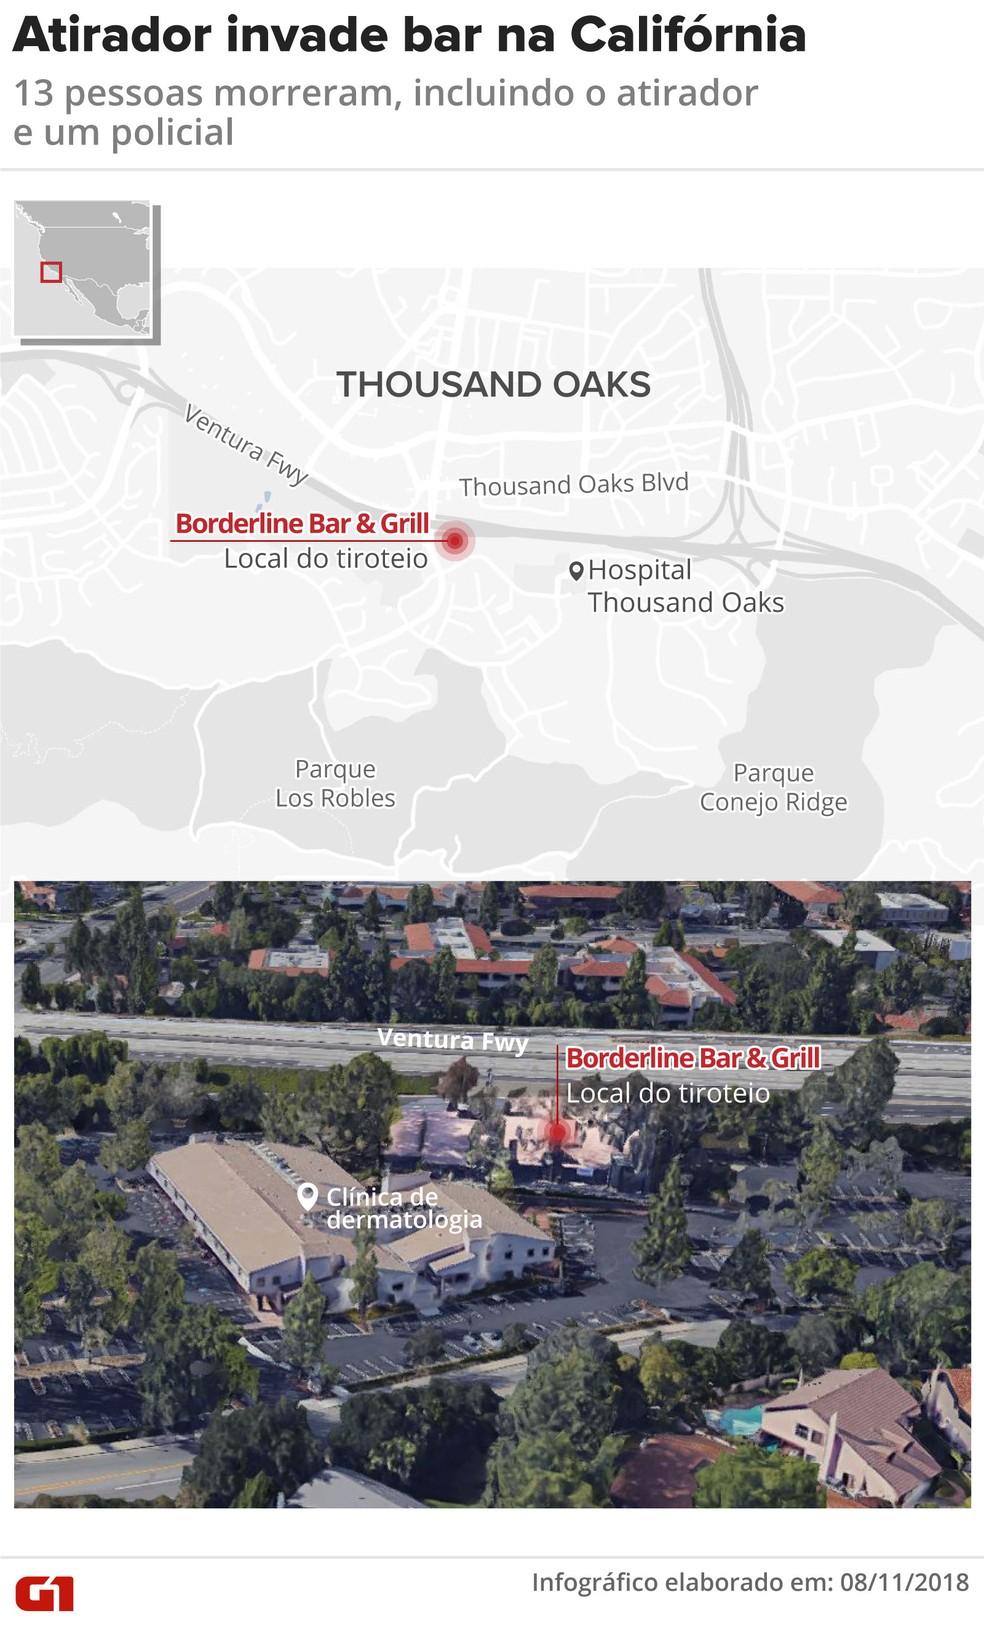 Mapa mostra local do tiroteio na Califórnia — Foto: Infográfico: Juliane Monteiro/G1